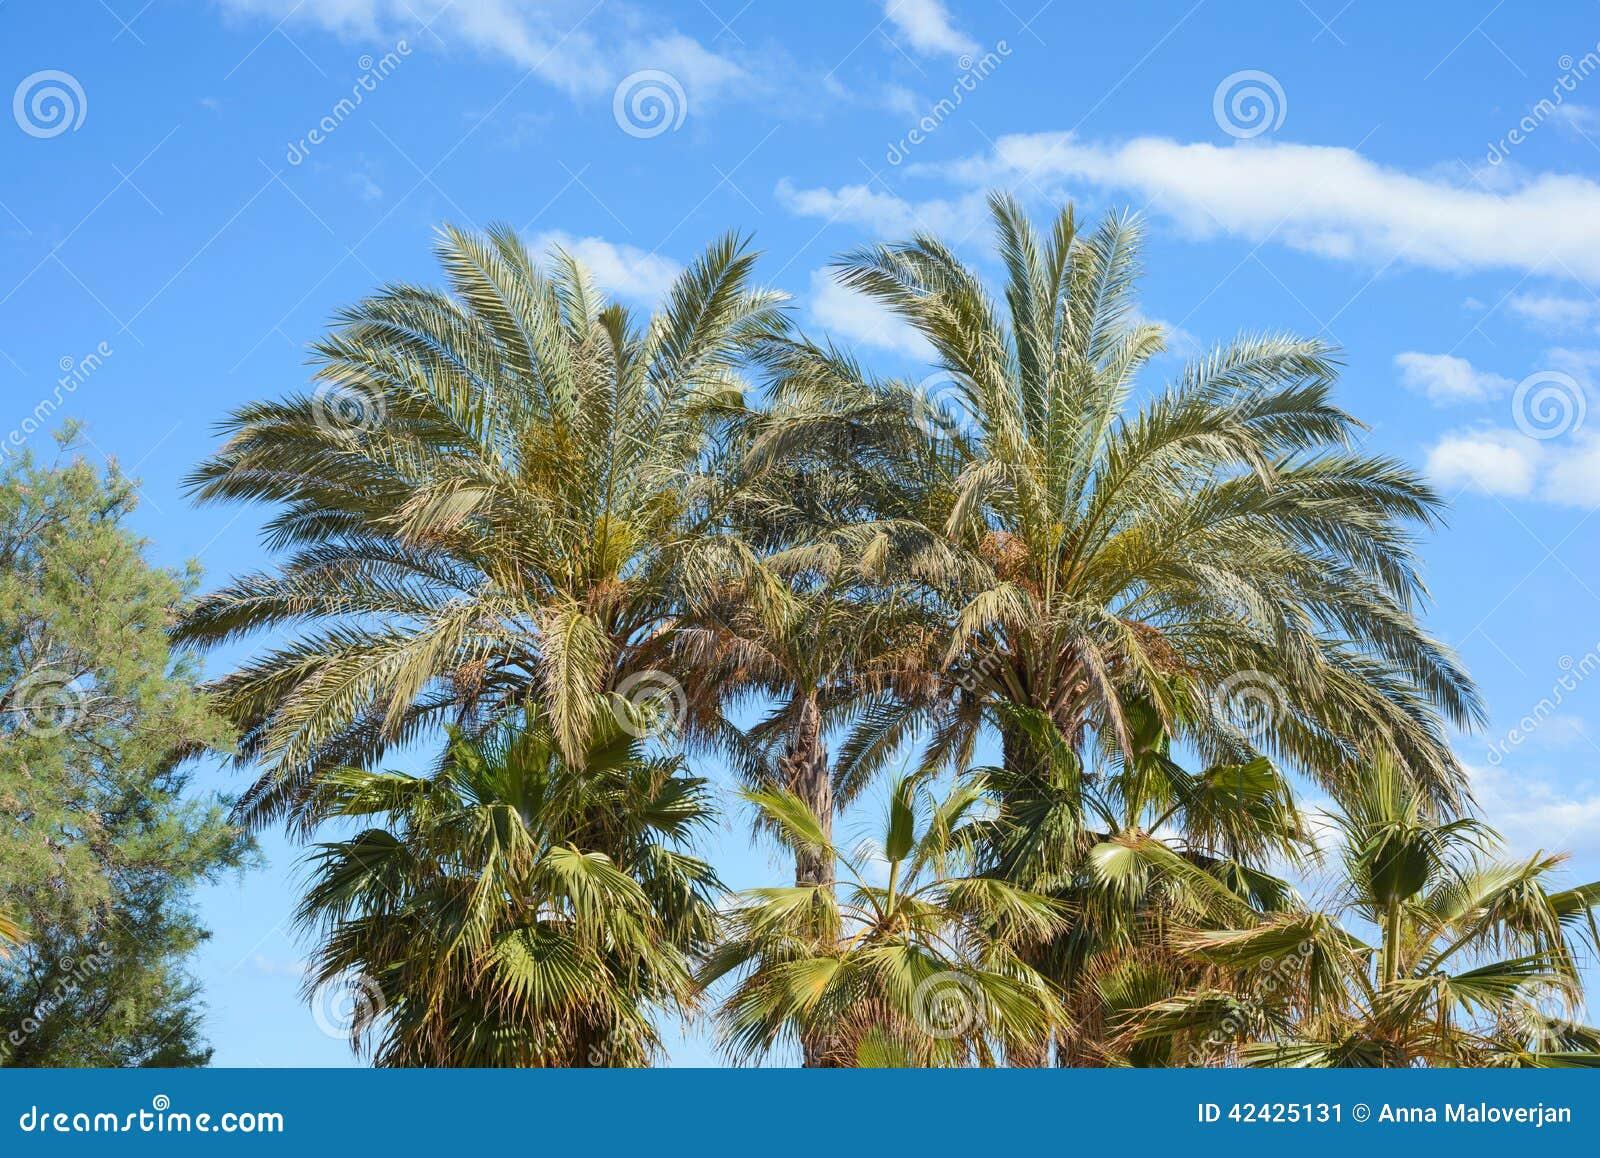 trees palm blue - photo #40